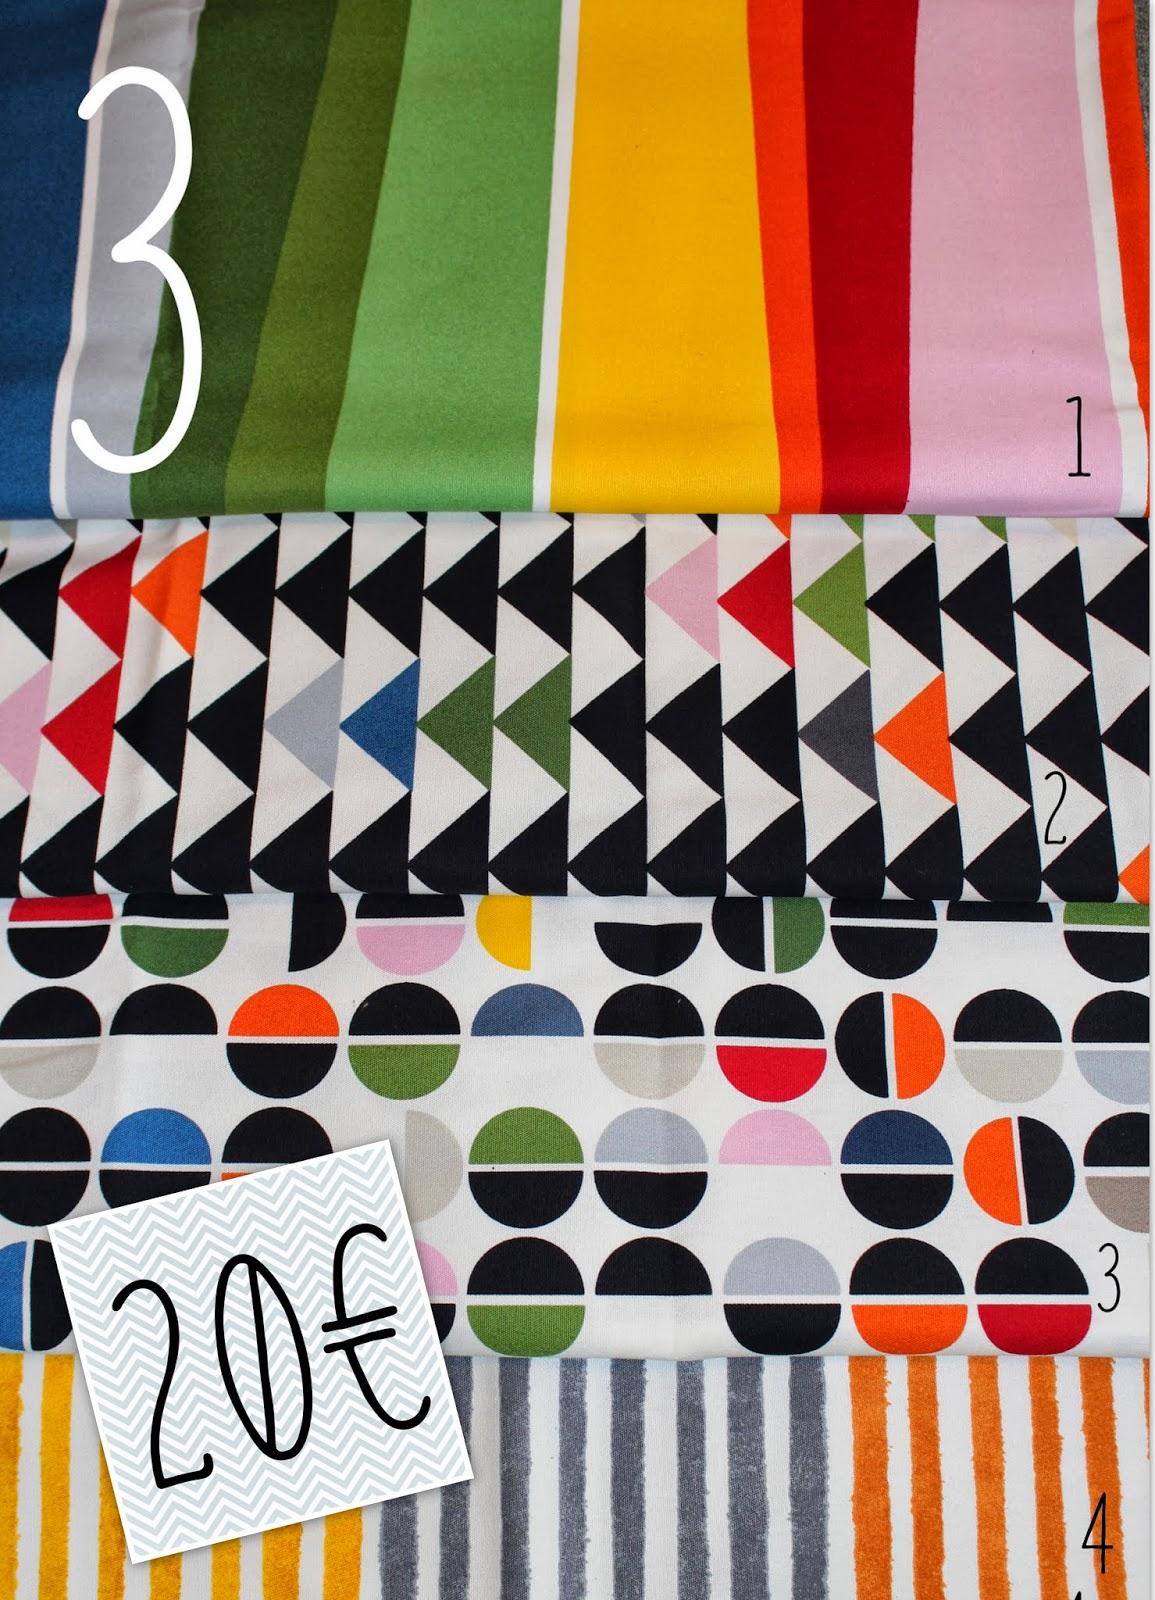 ikea stoffe boxbag als zum aufsetzen nhen diy ikea stoff. Black Bedroom Furniture Sets. Home Design Ideas